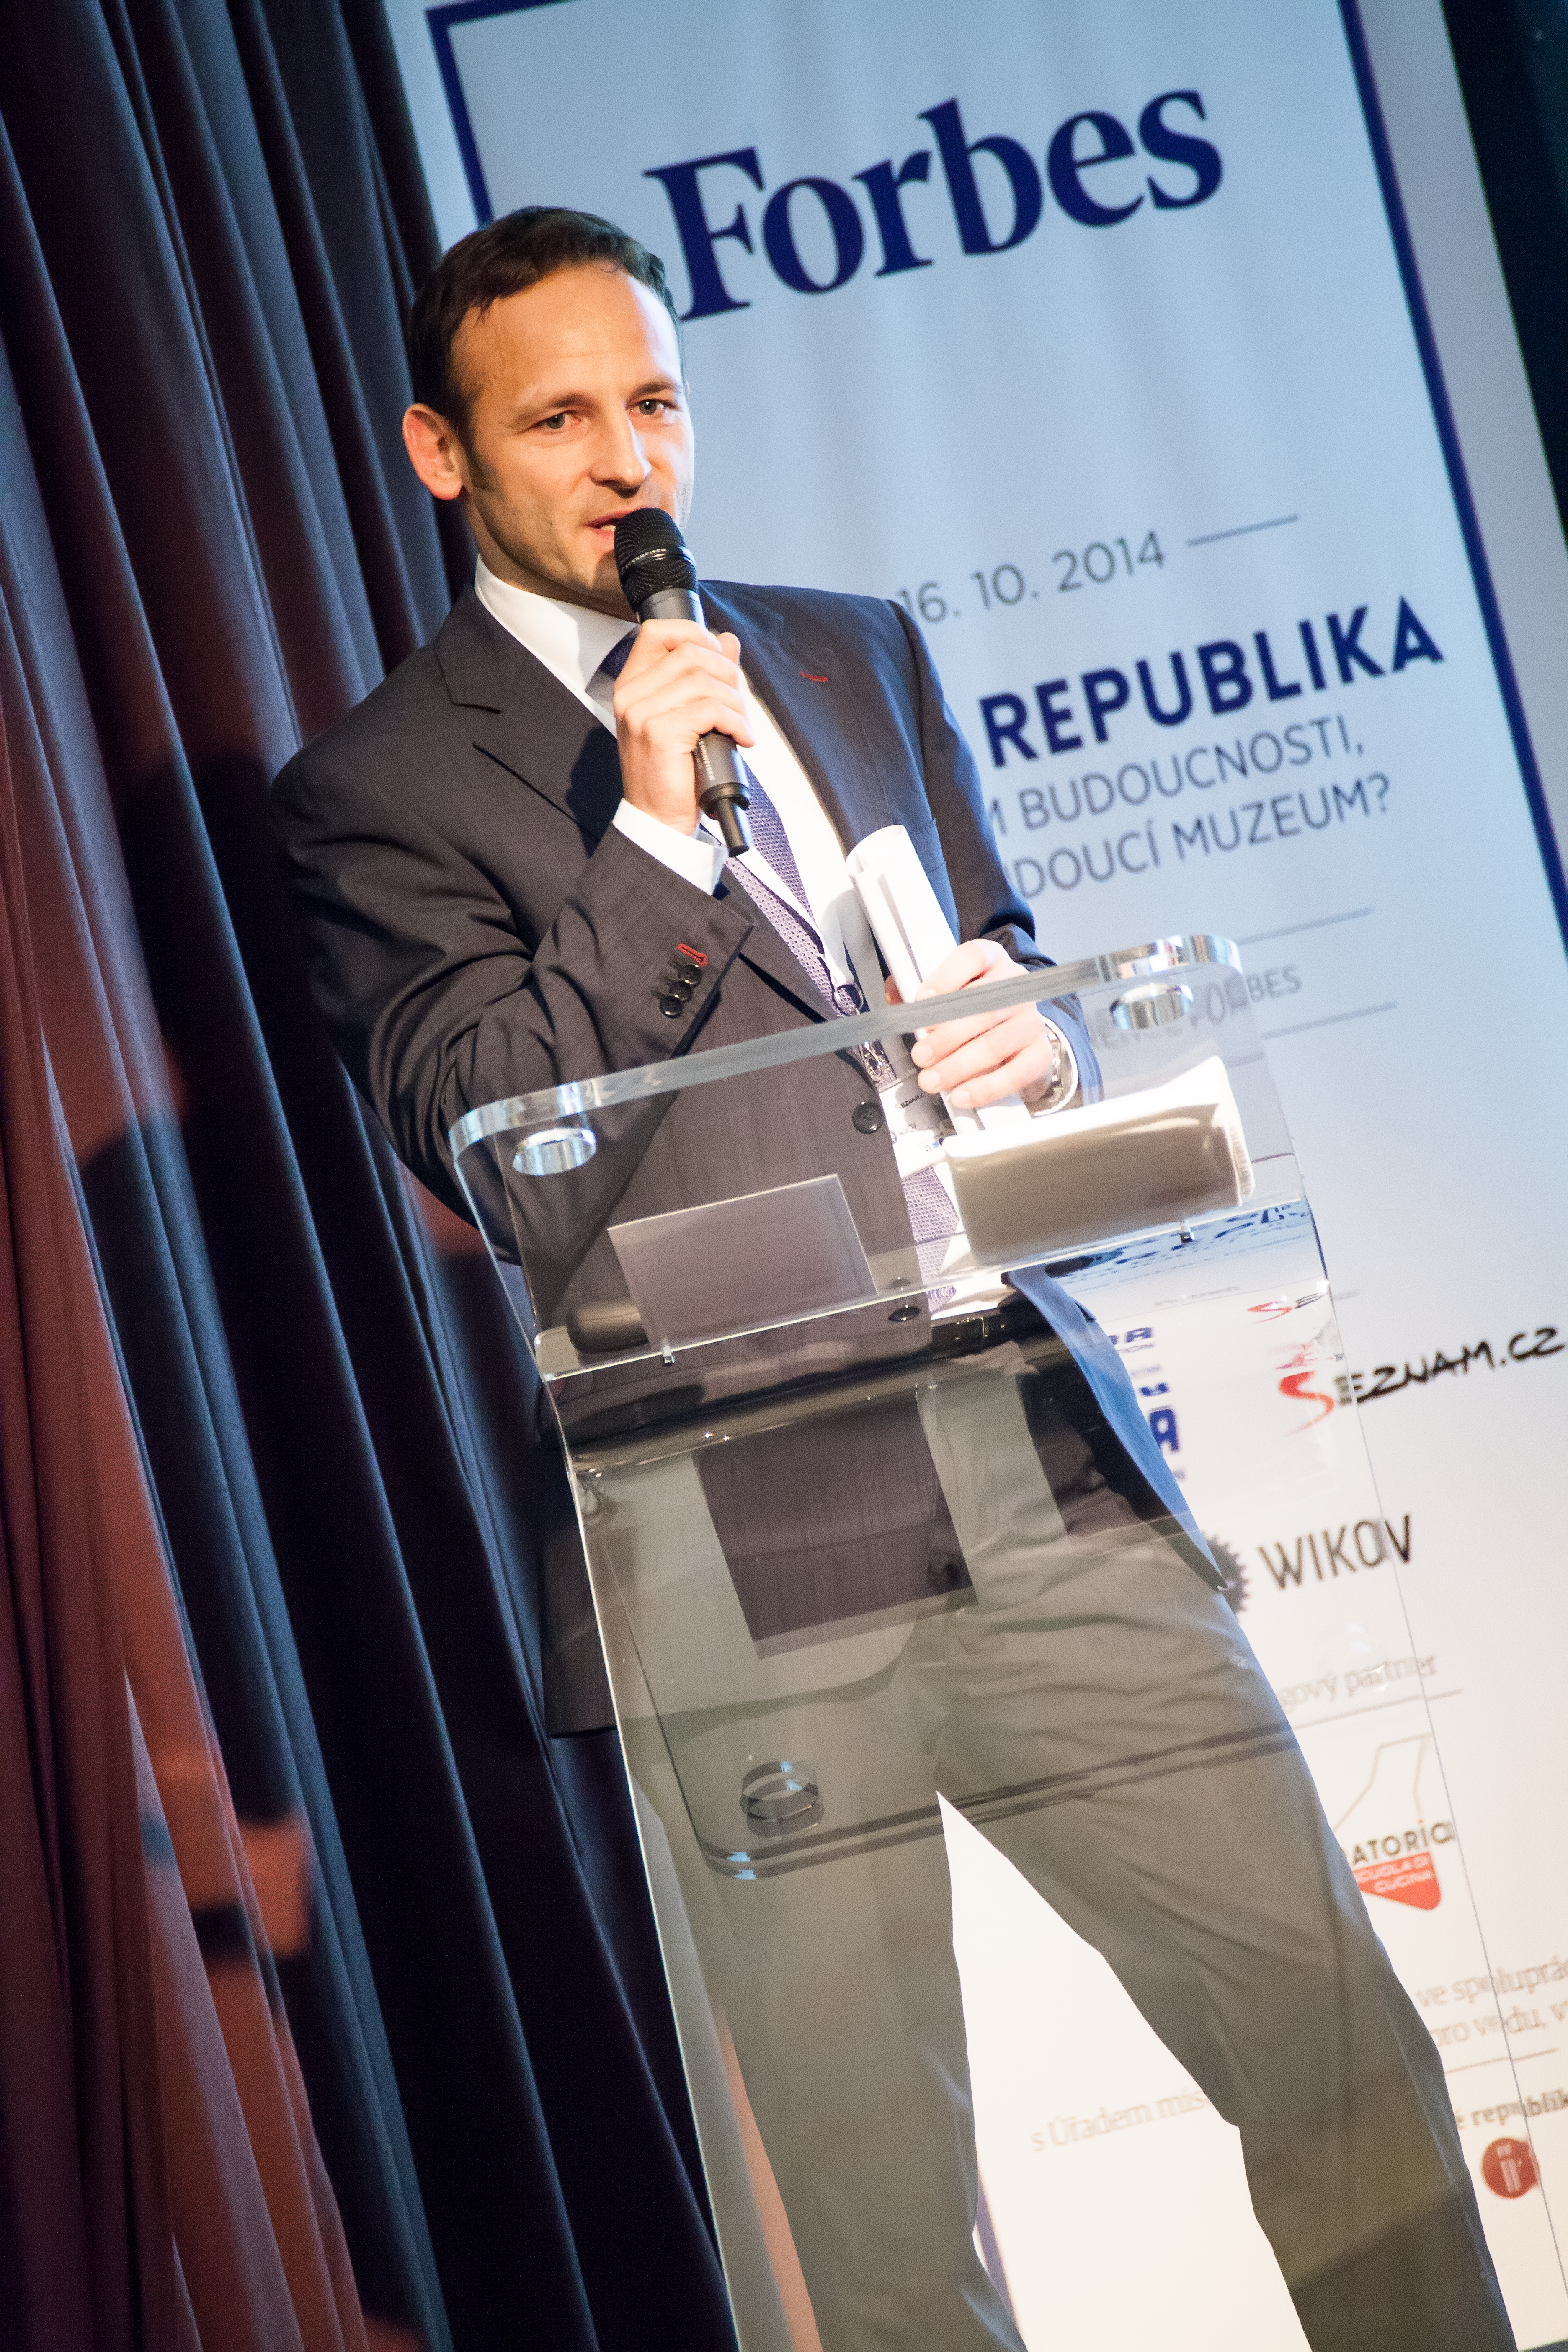 Konference Forbes 16.10.2014-80